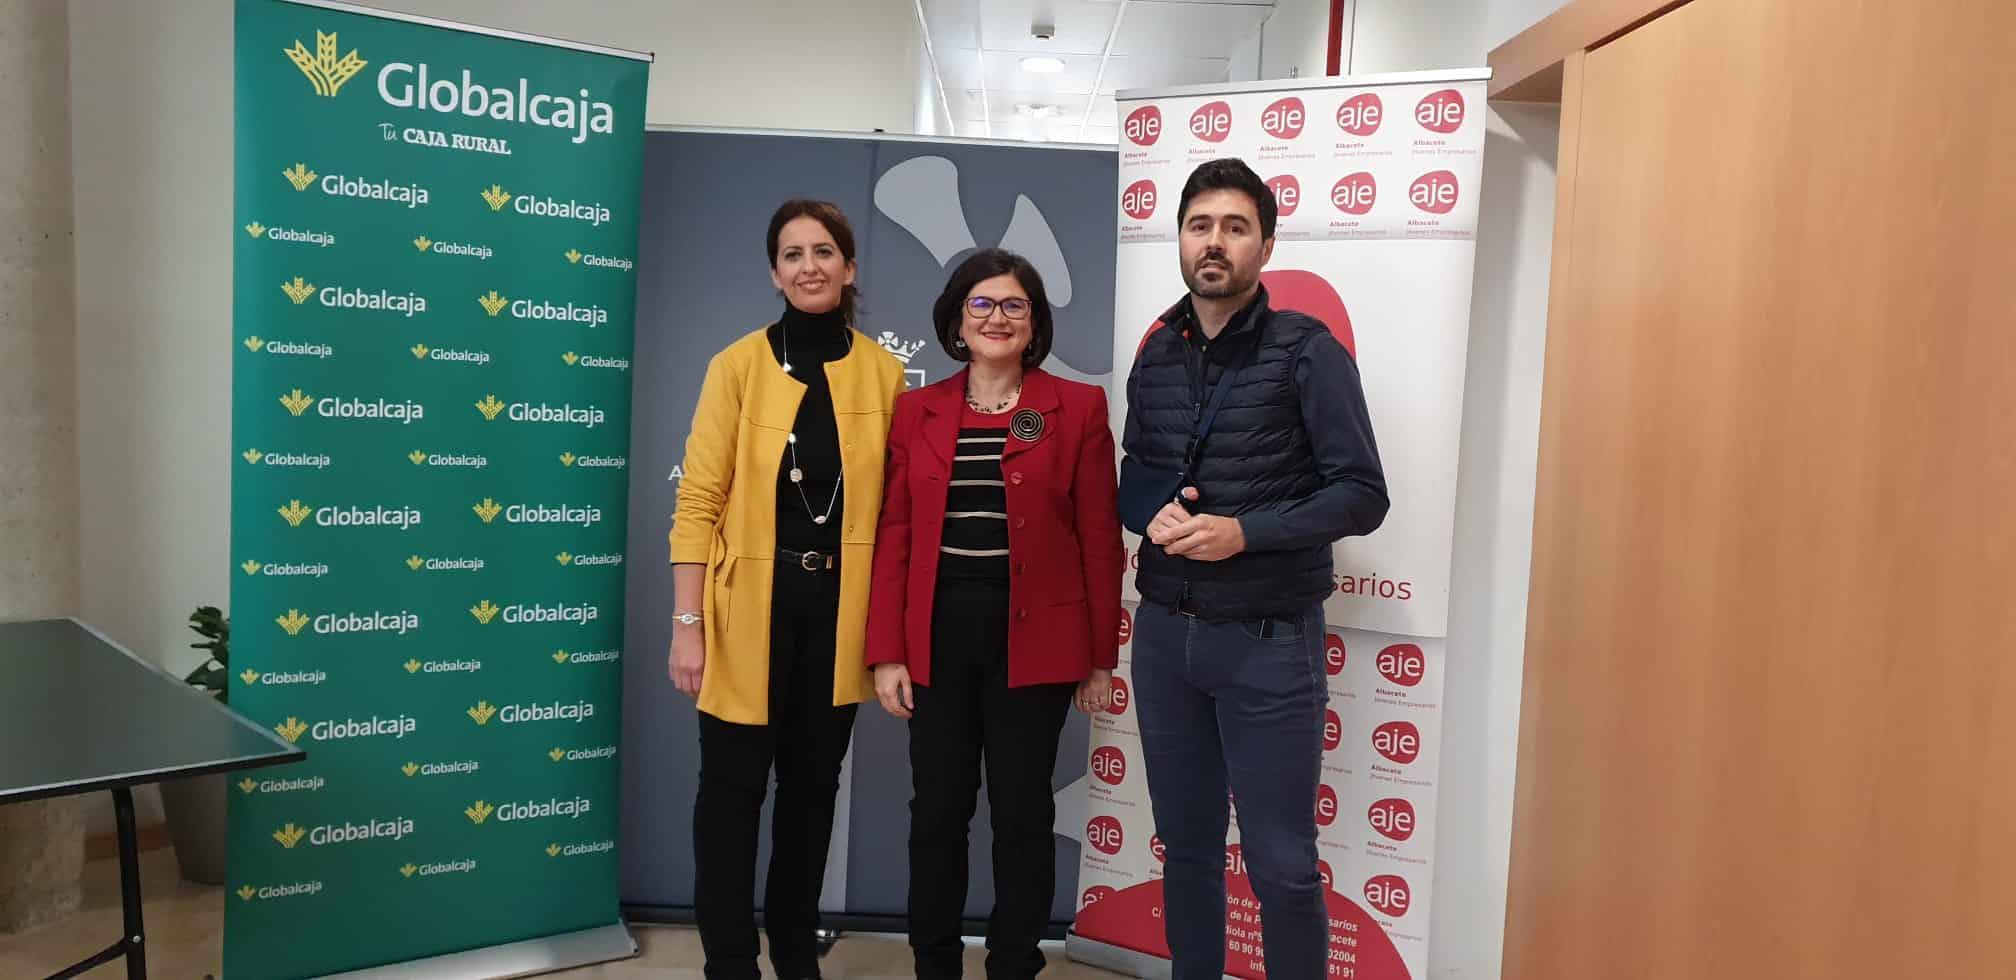 https://blog.globalcaja.es/wp-content/uploads/2019/11/primera-feria-emprendimiento-de-aje-albacete.jpg